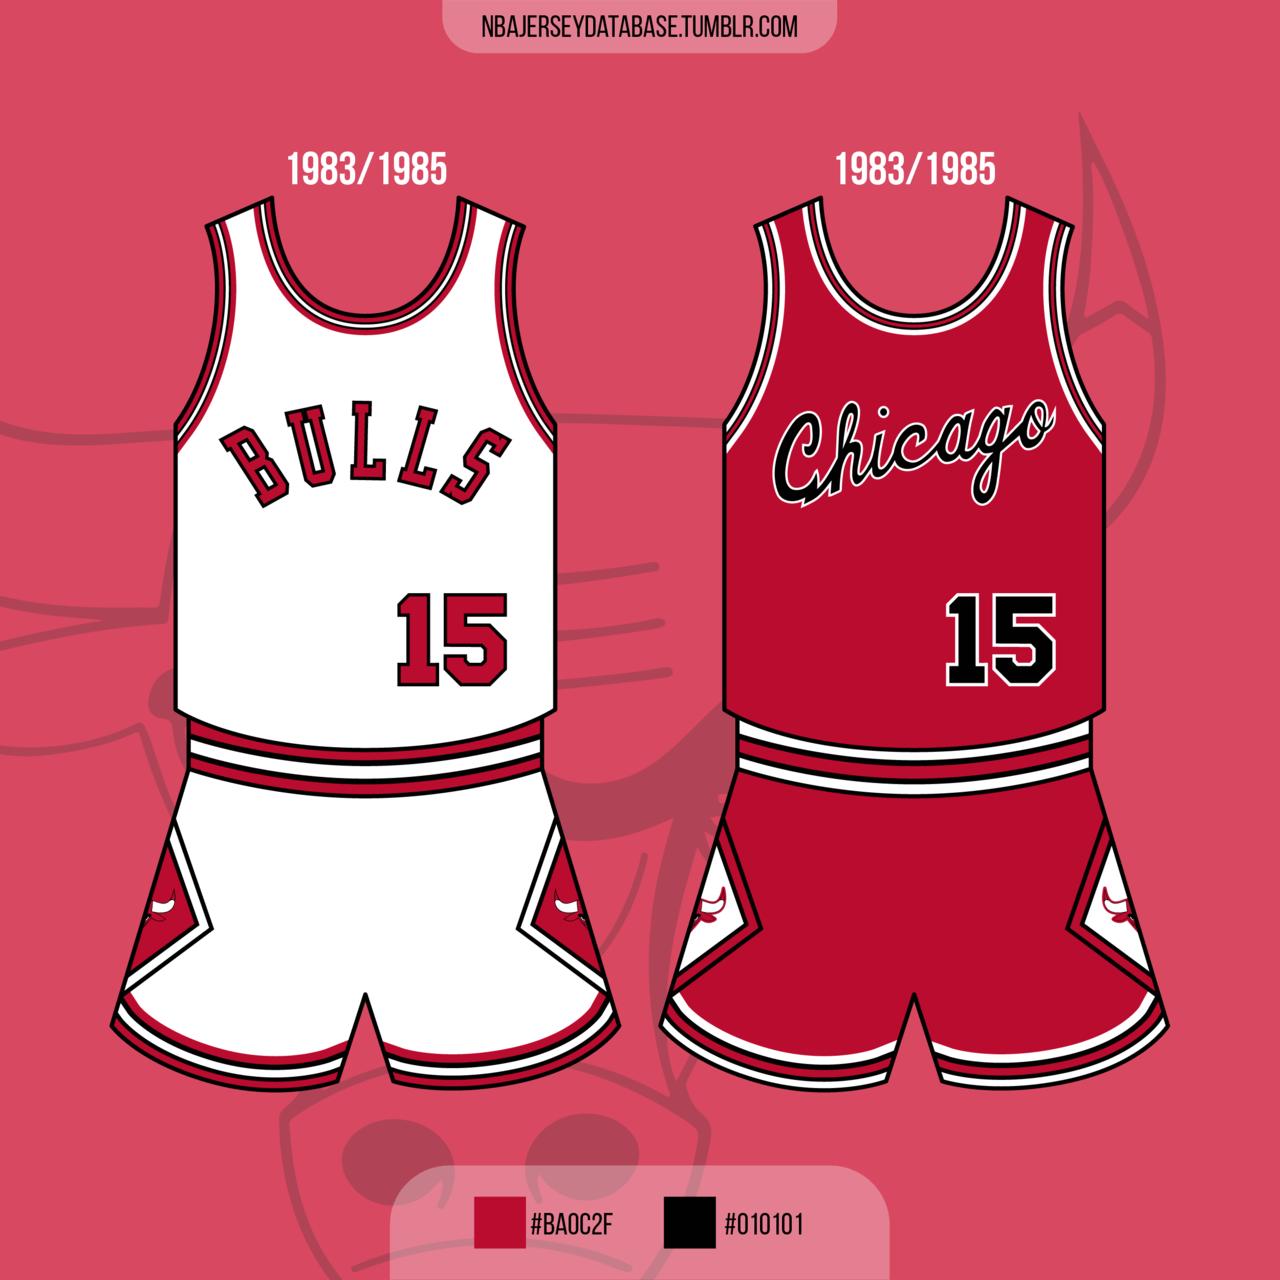 Chicago Bulls 1983-1985 Record: 65-99 (40%)